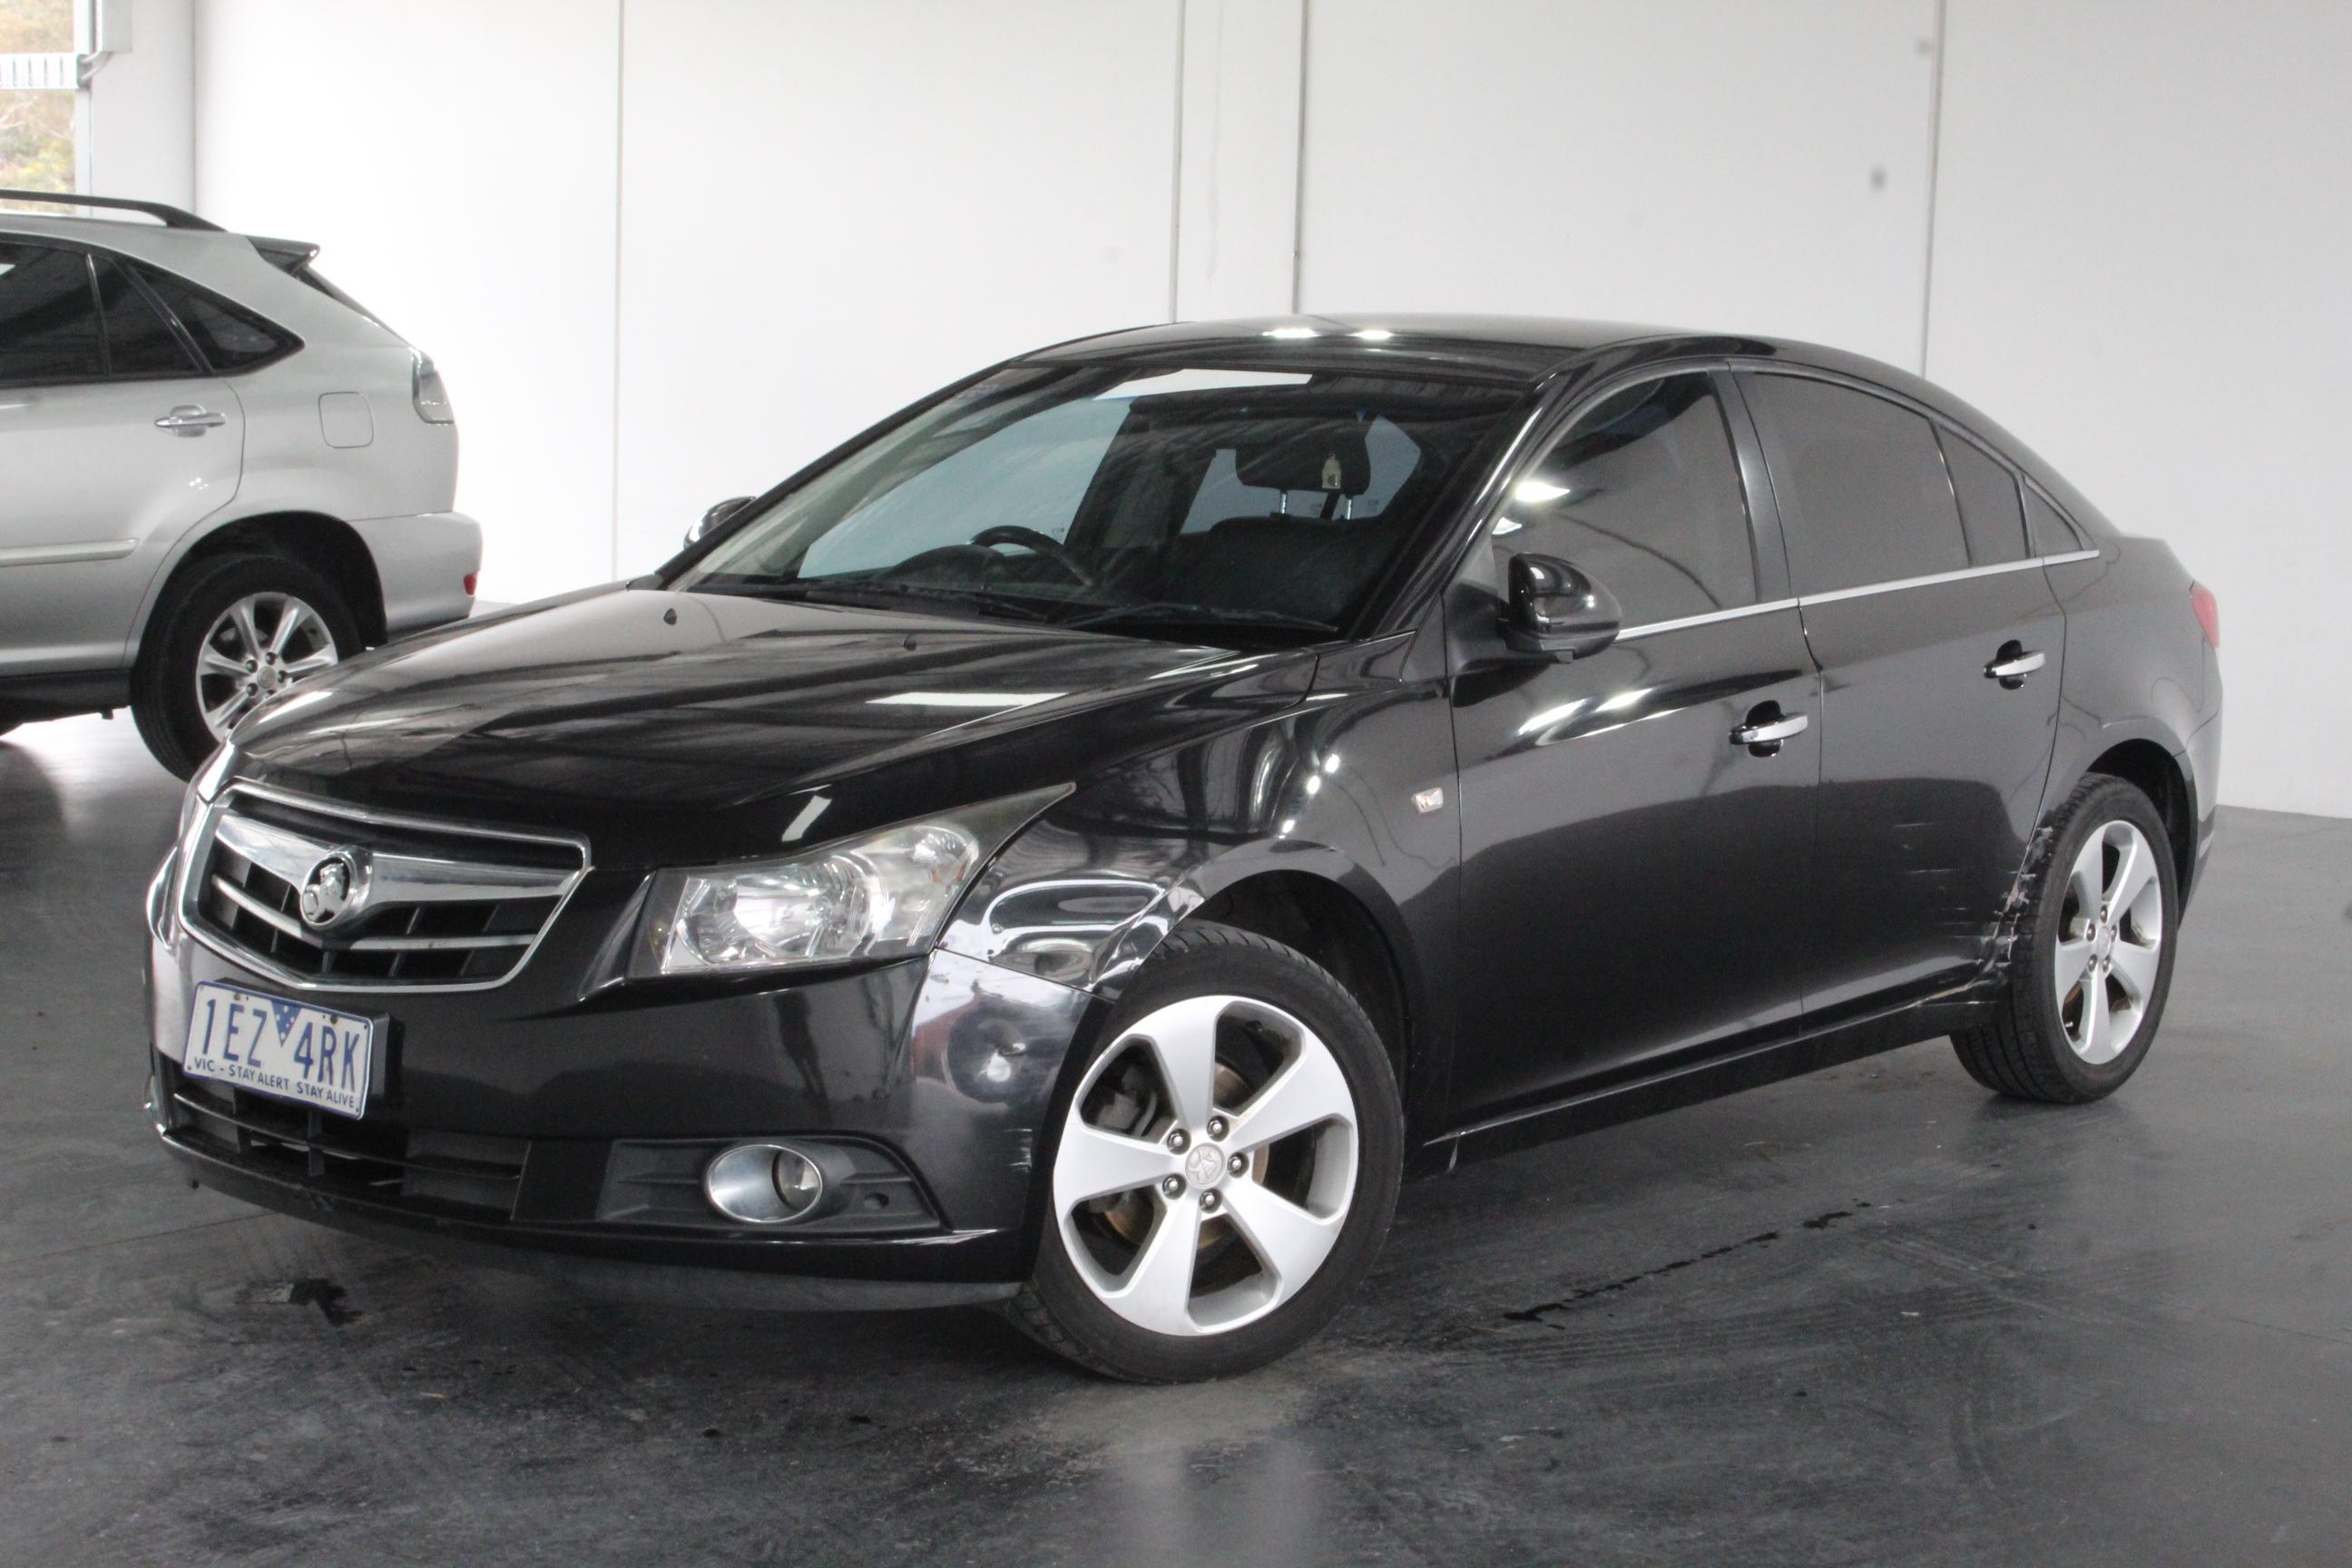 2010 Holden Cruze CDX JG Manual Sedan Auction (0001-3433949) | GraysOnline  Australia